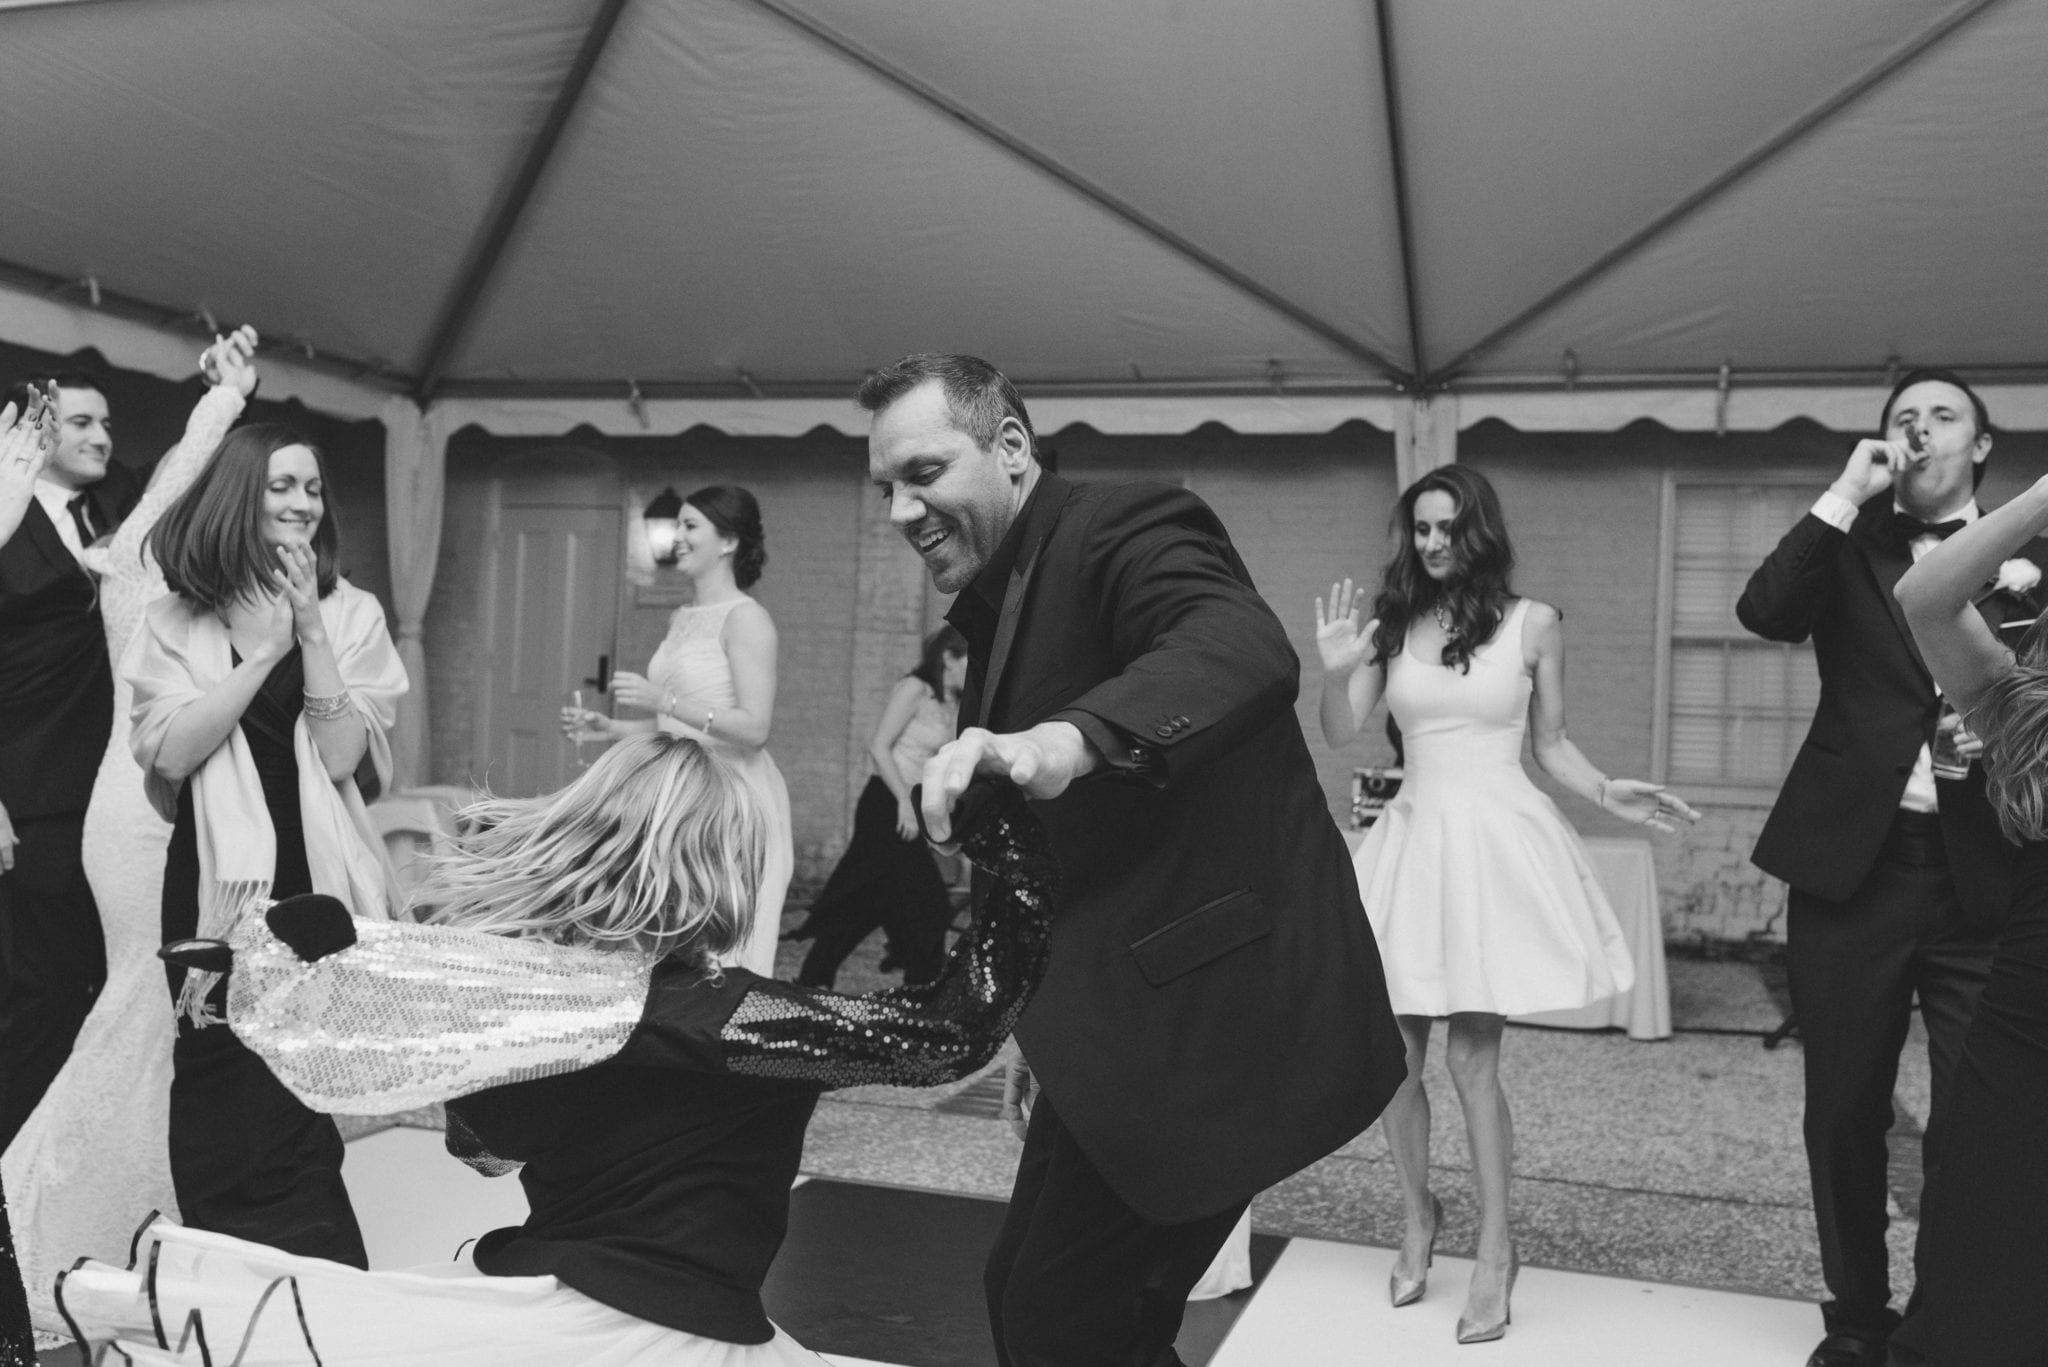 Fox S Wedding.View More Http Priscillathomas Pass Us Erika G Jack S Bunn Dj